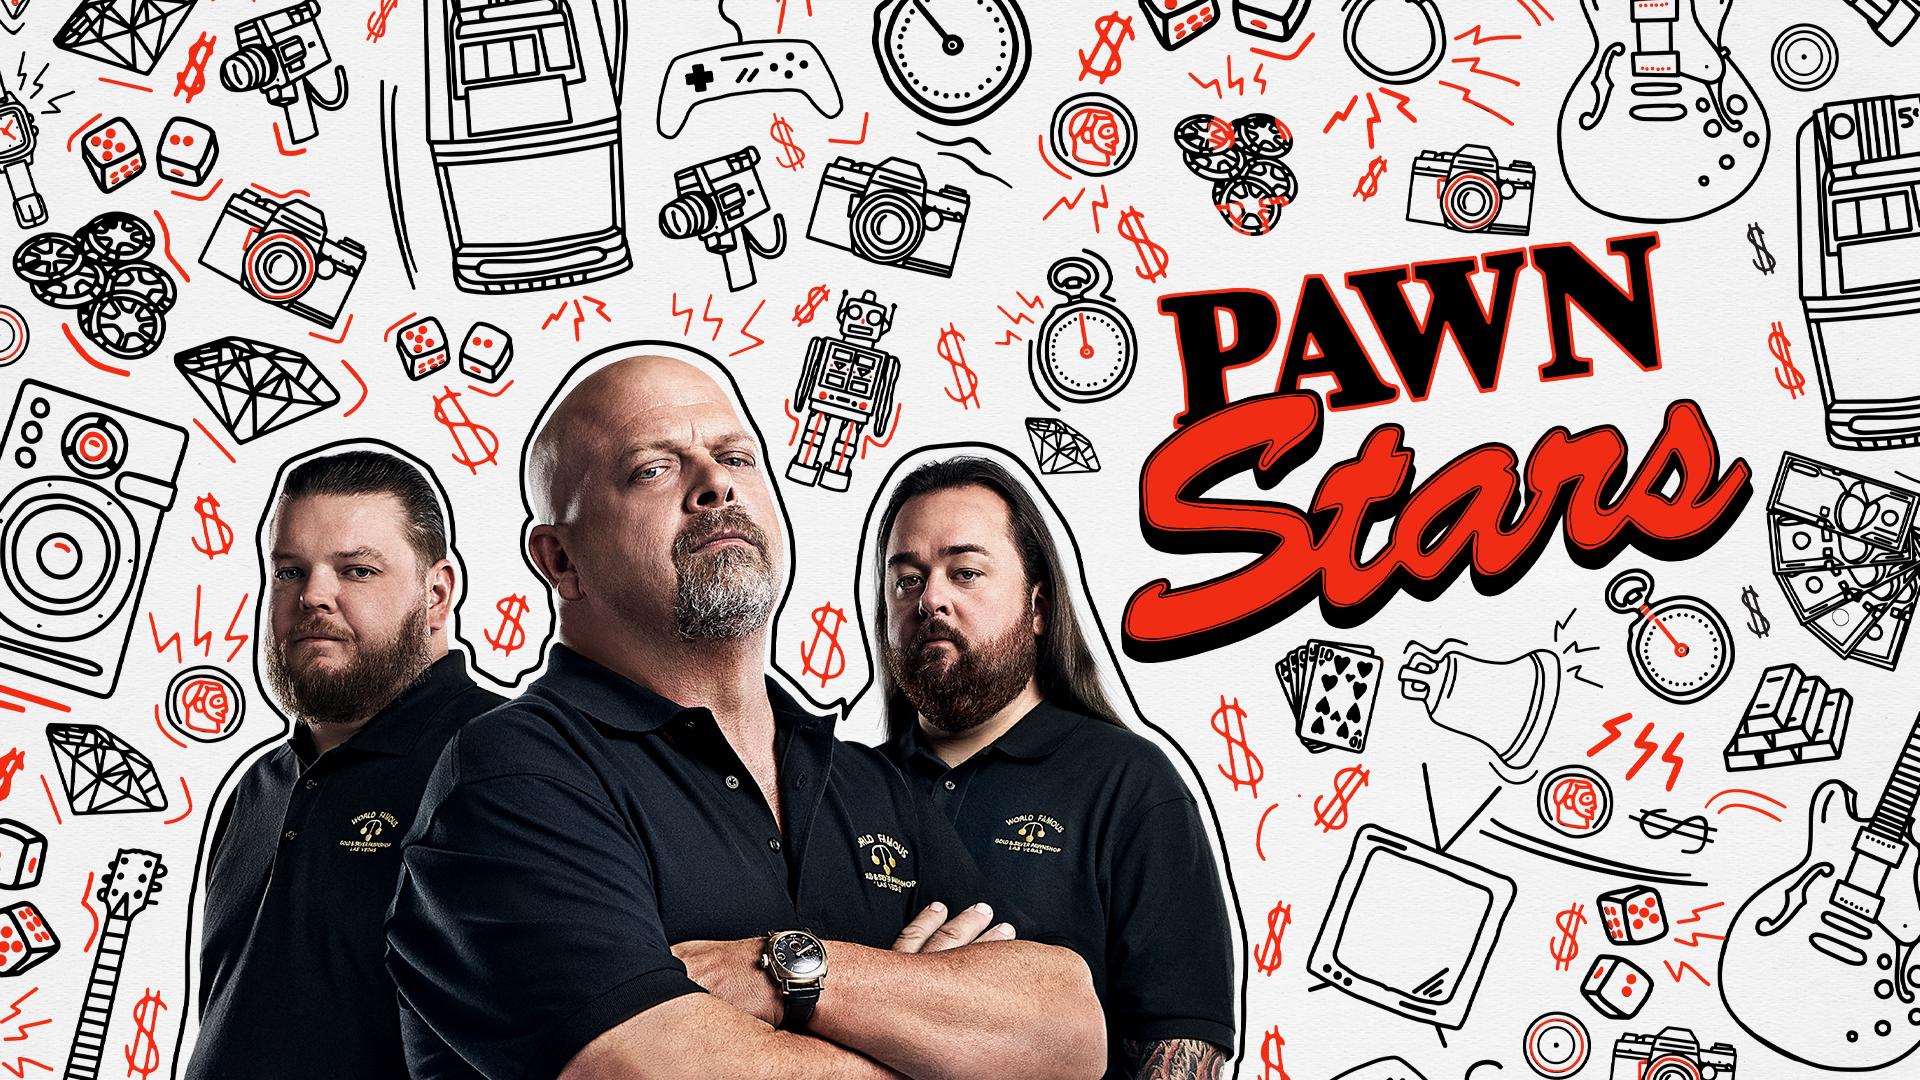 Pawn Stars Alt Image